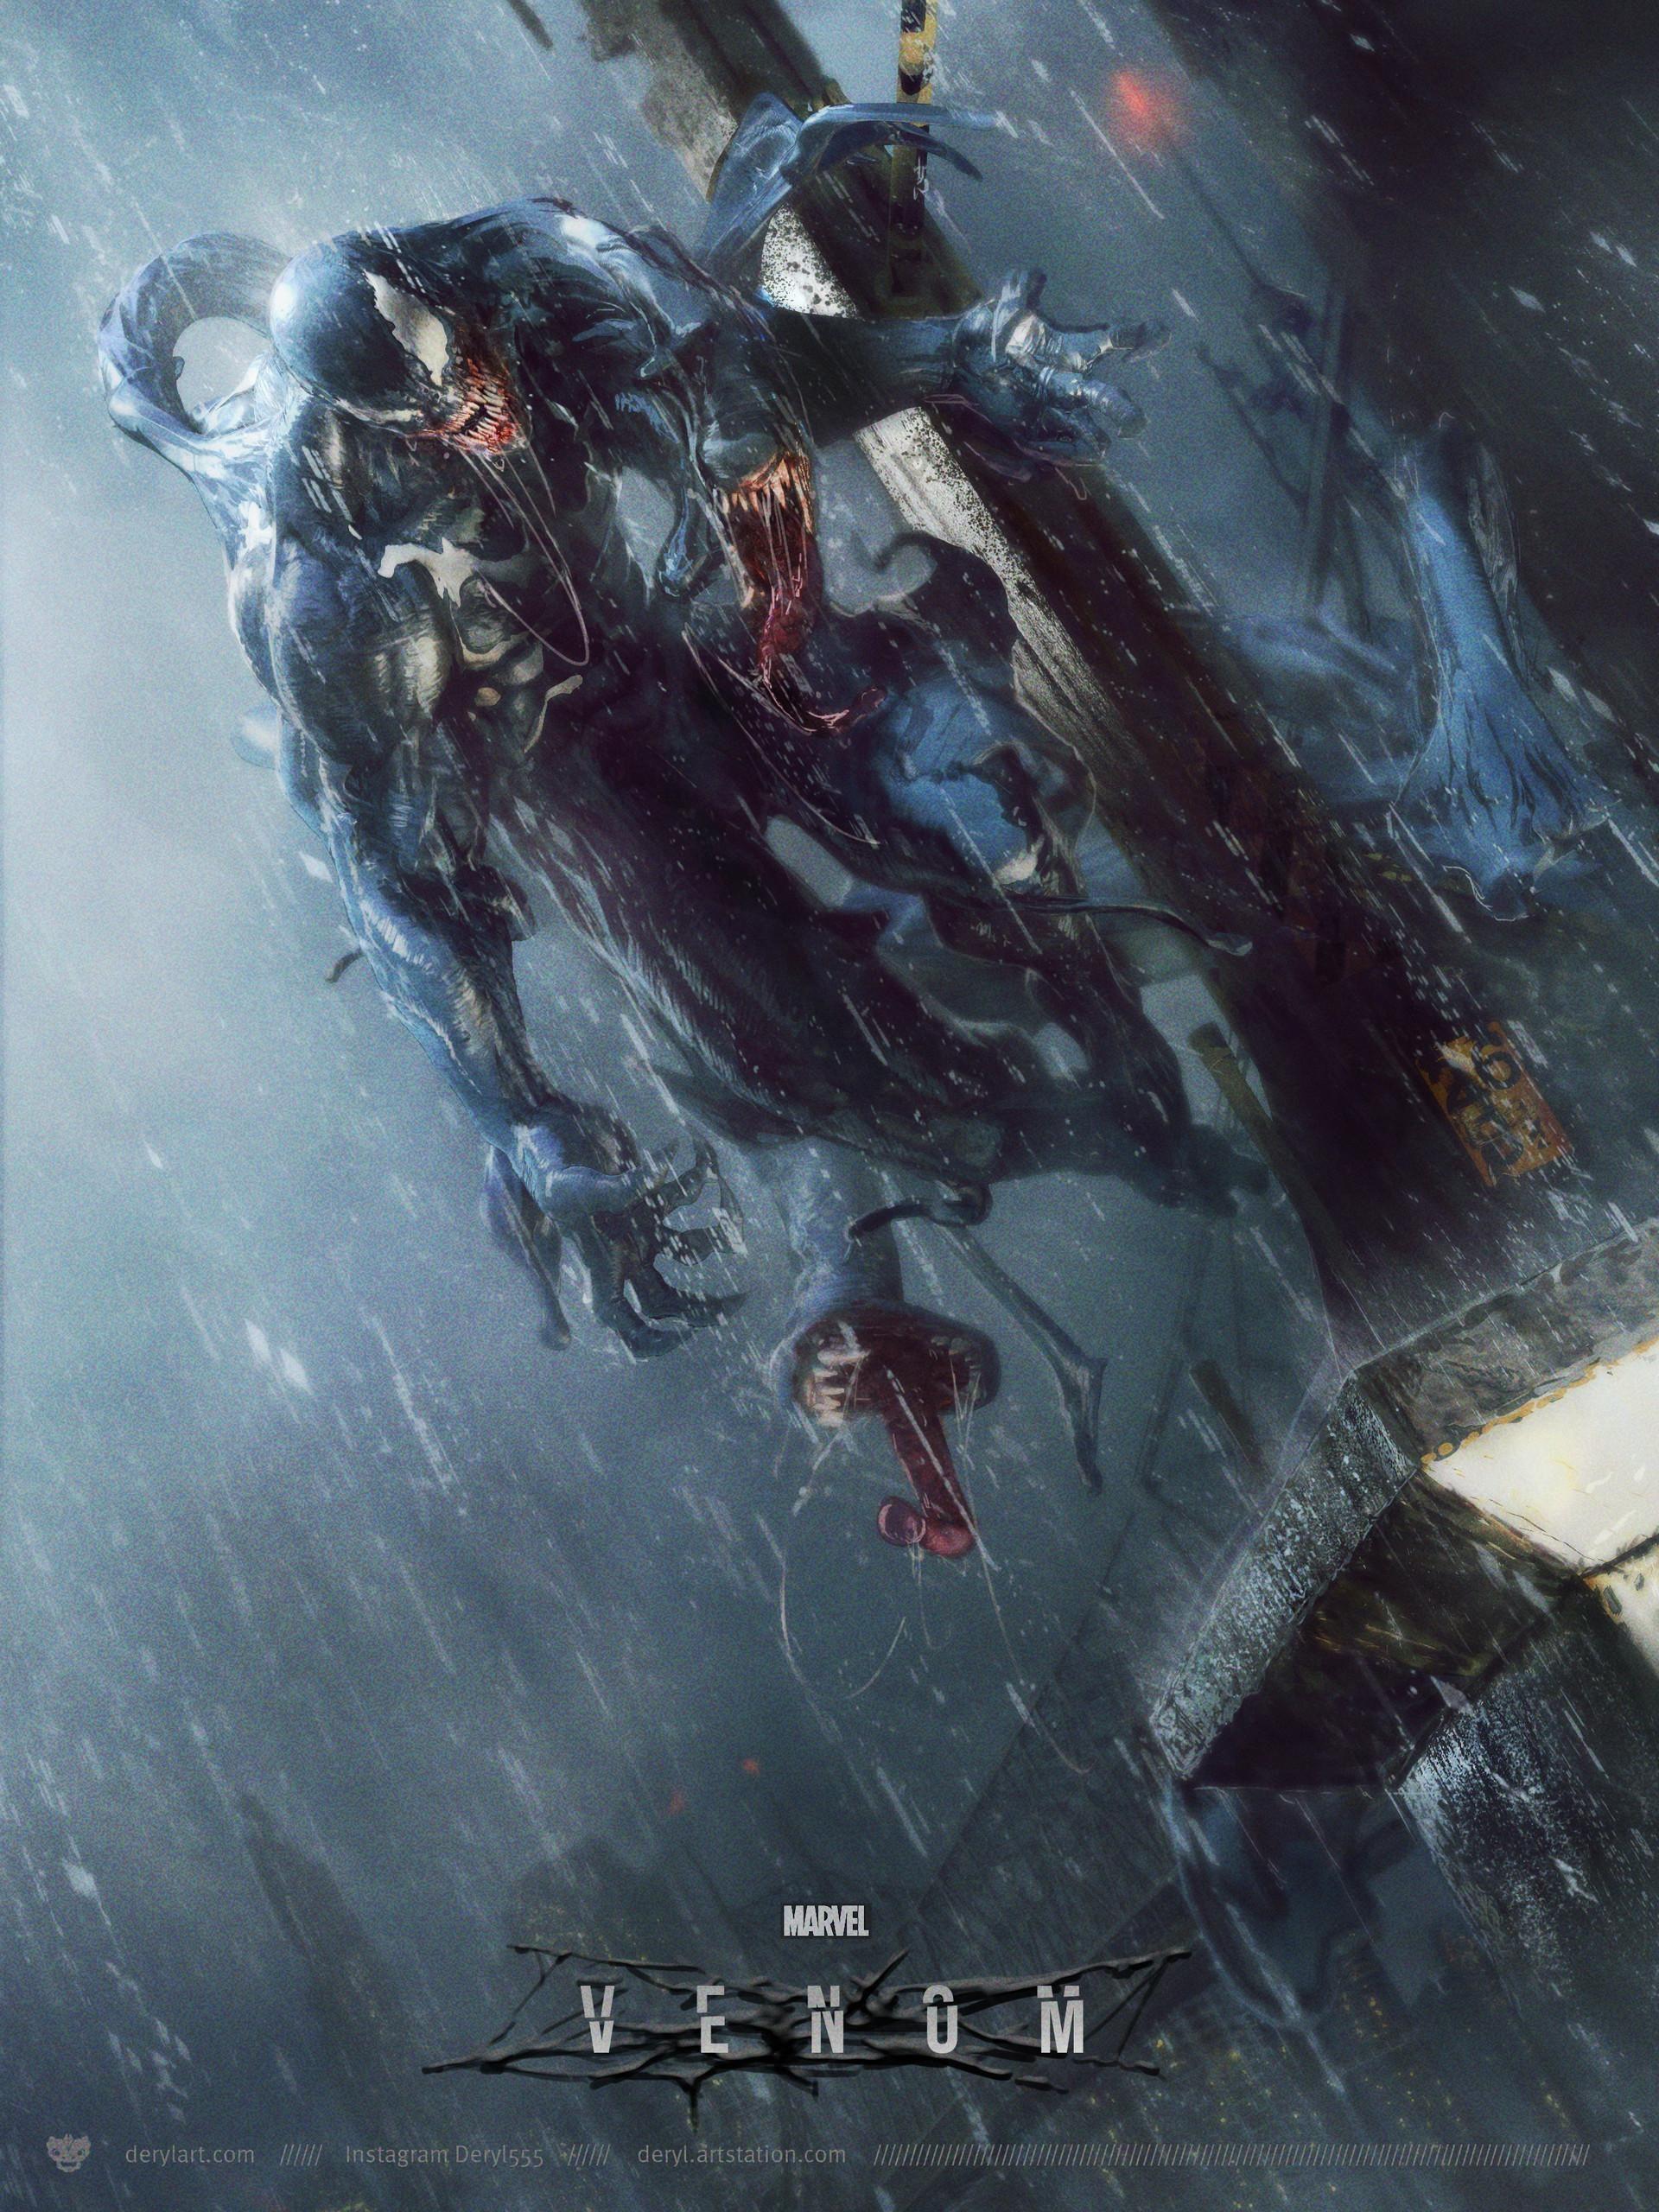 Venom 2018 Hd Wallpaper From Gallsource Com Comics Pinterest